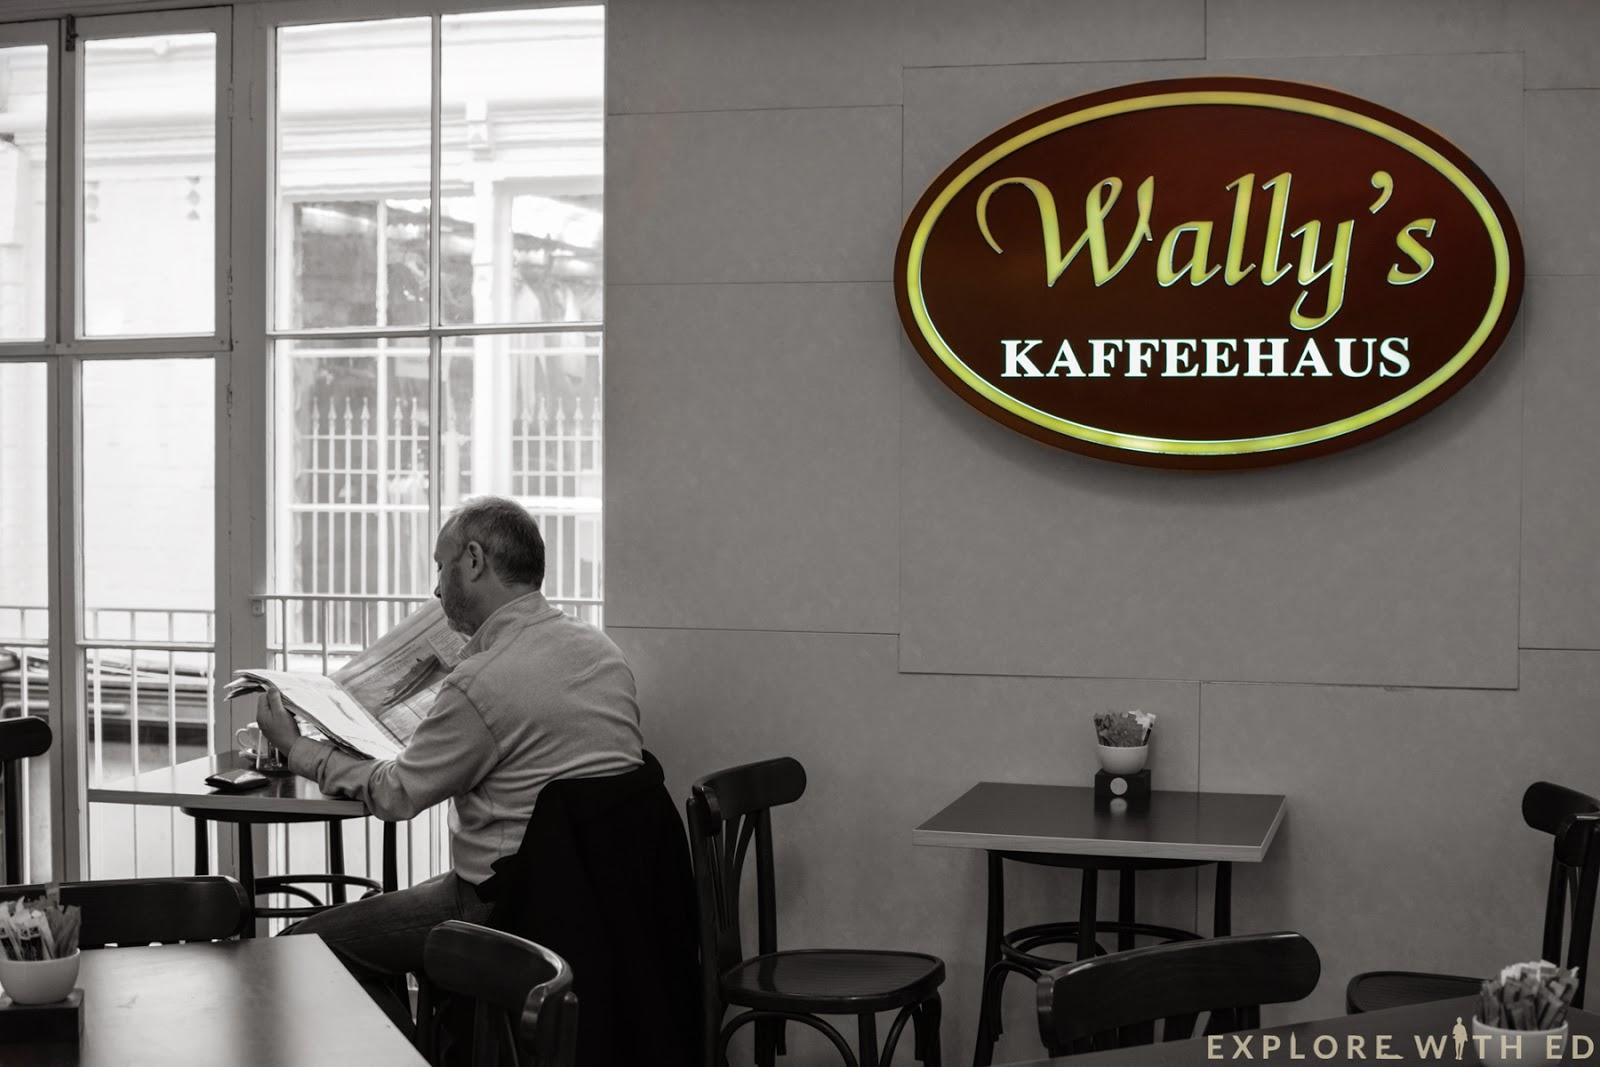 Wally's Kaffeehaus Interior